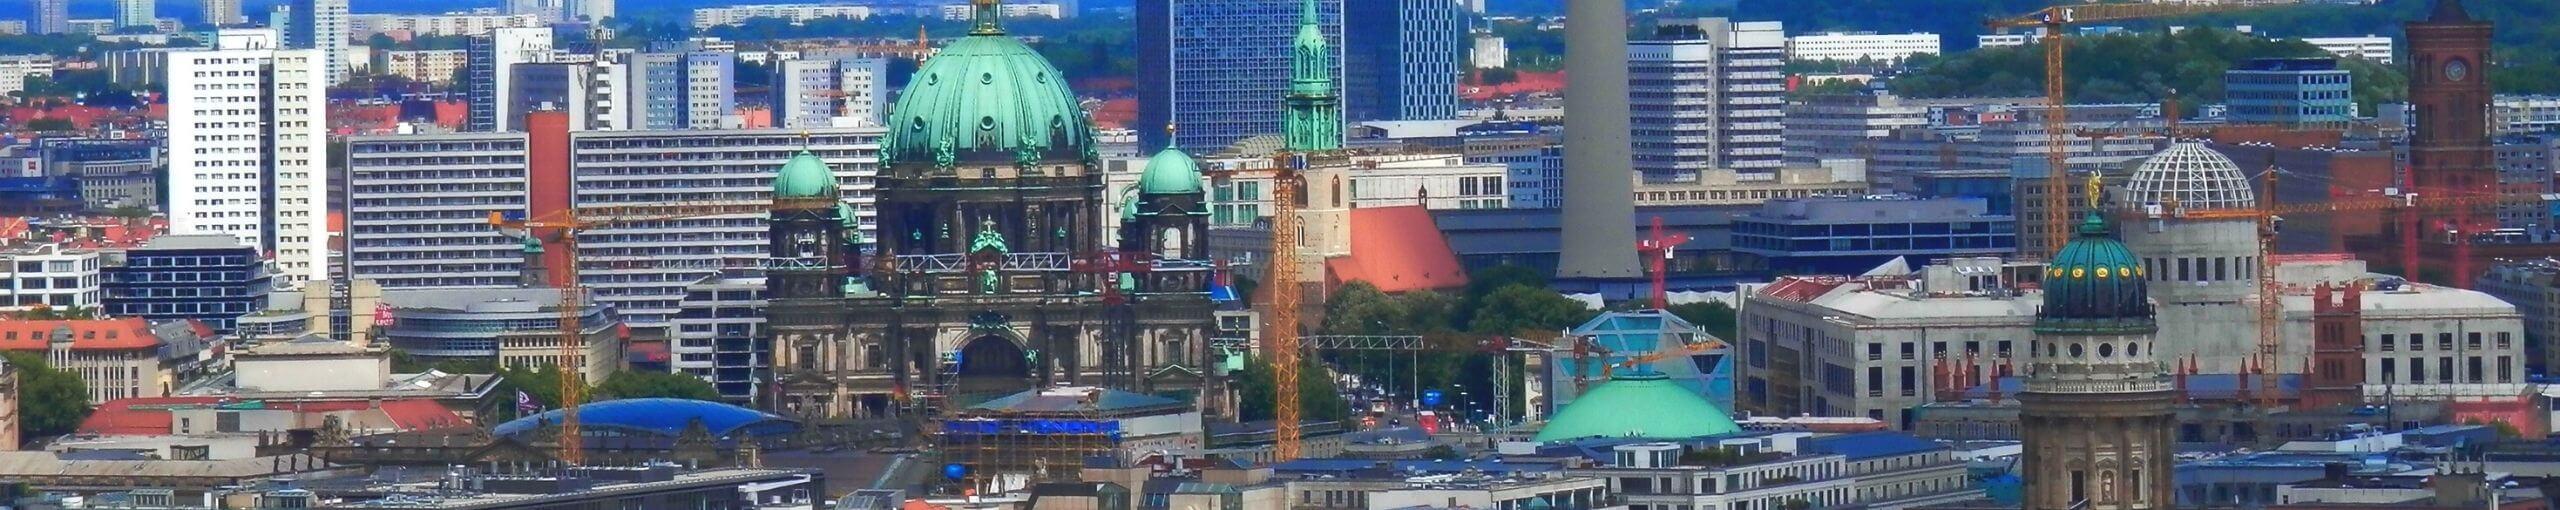 Berlín, Alemania.